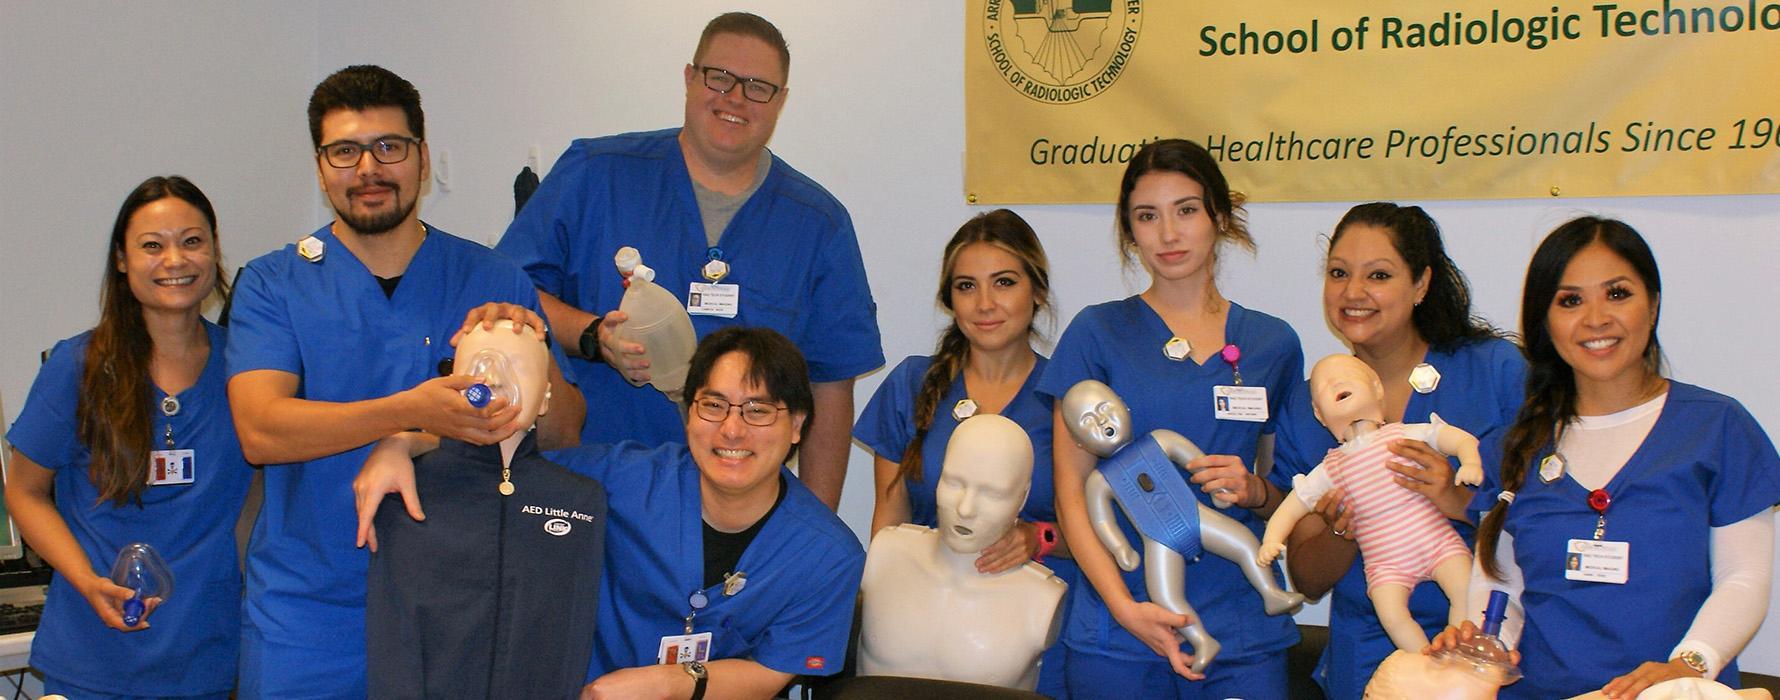 Radiologic Technology students